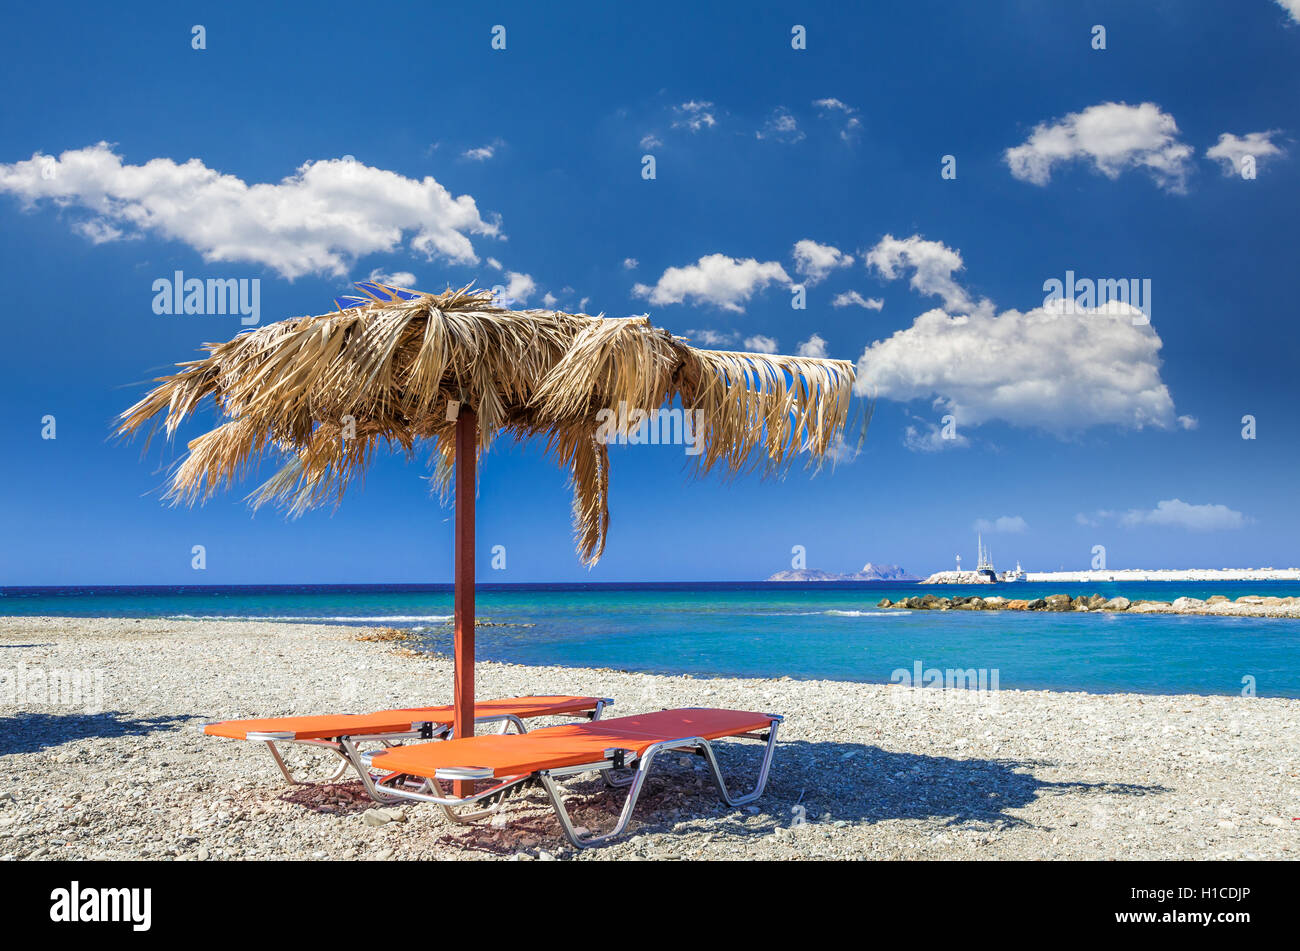 Straw umbrella on a sandy beach in Greece. Beach chairs with umbrellas on a beautiful beach in Crete island. - Stock Image